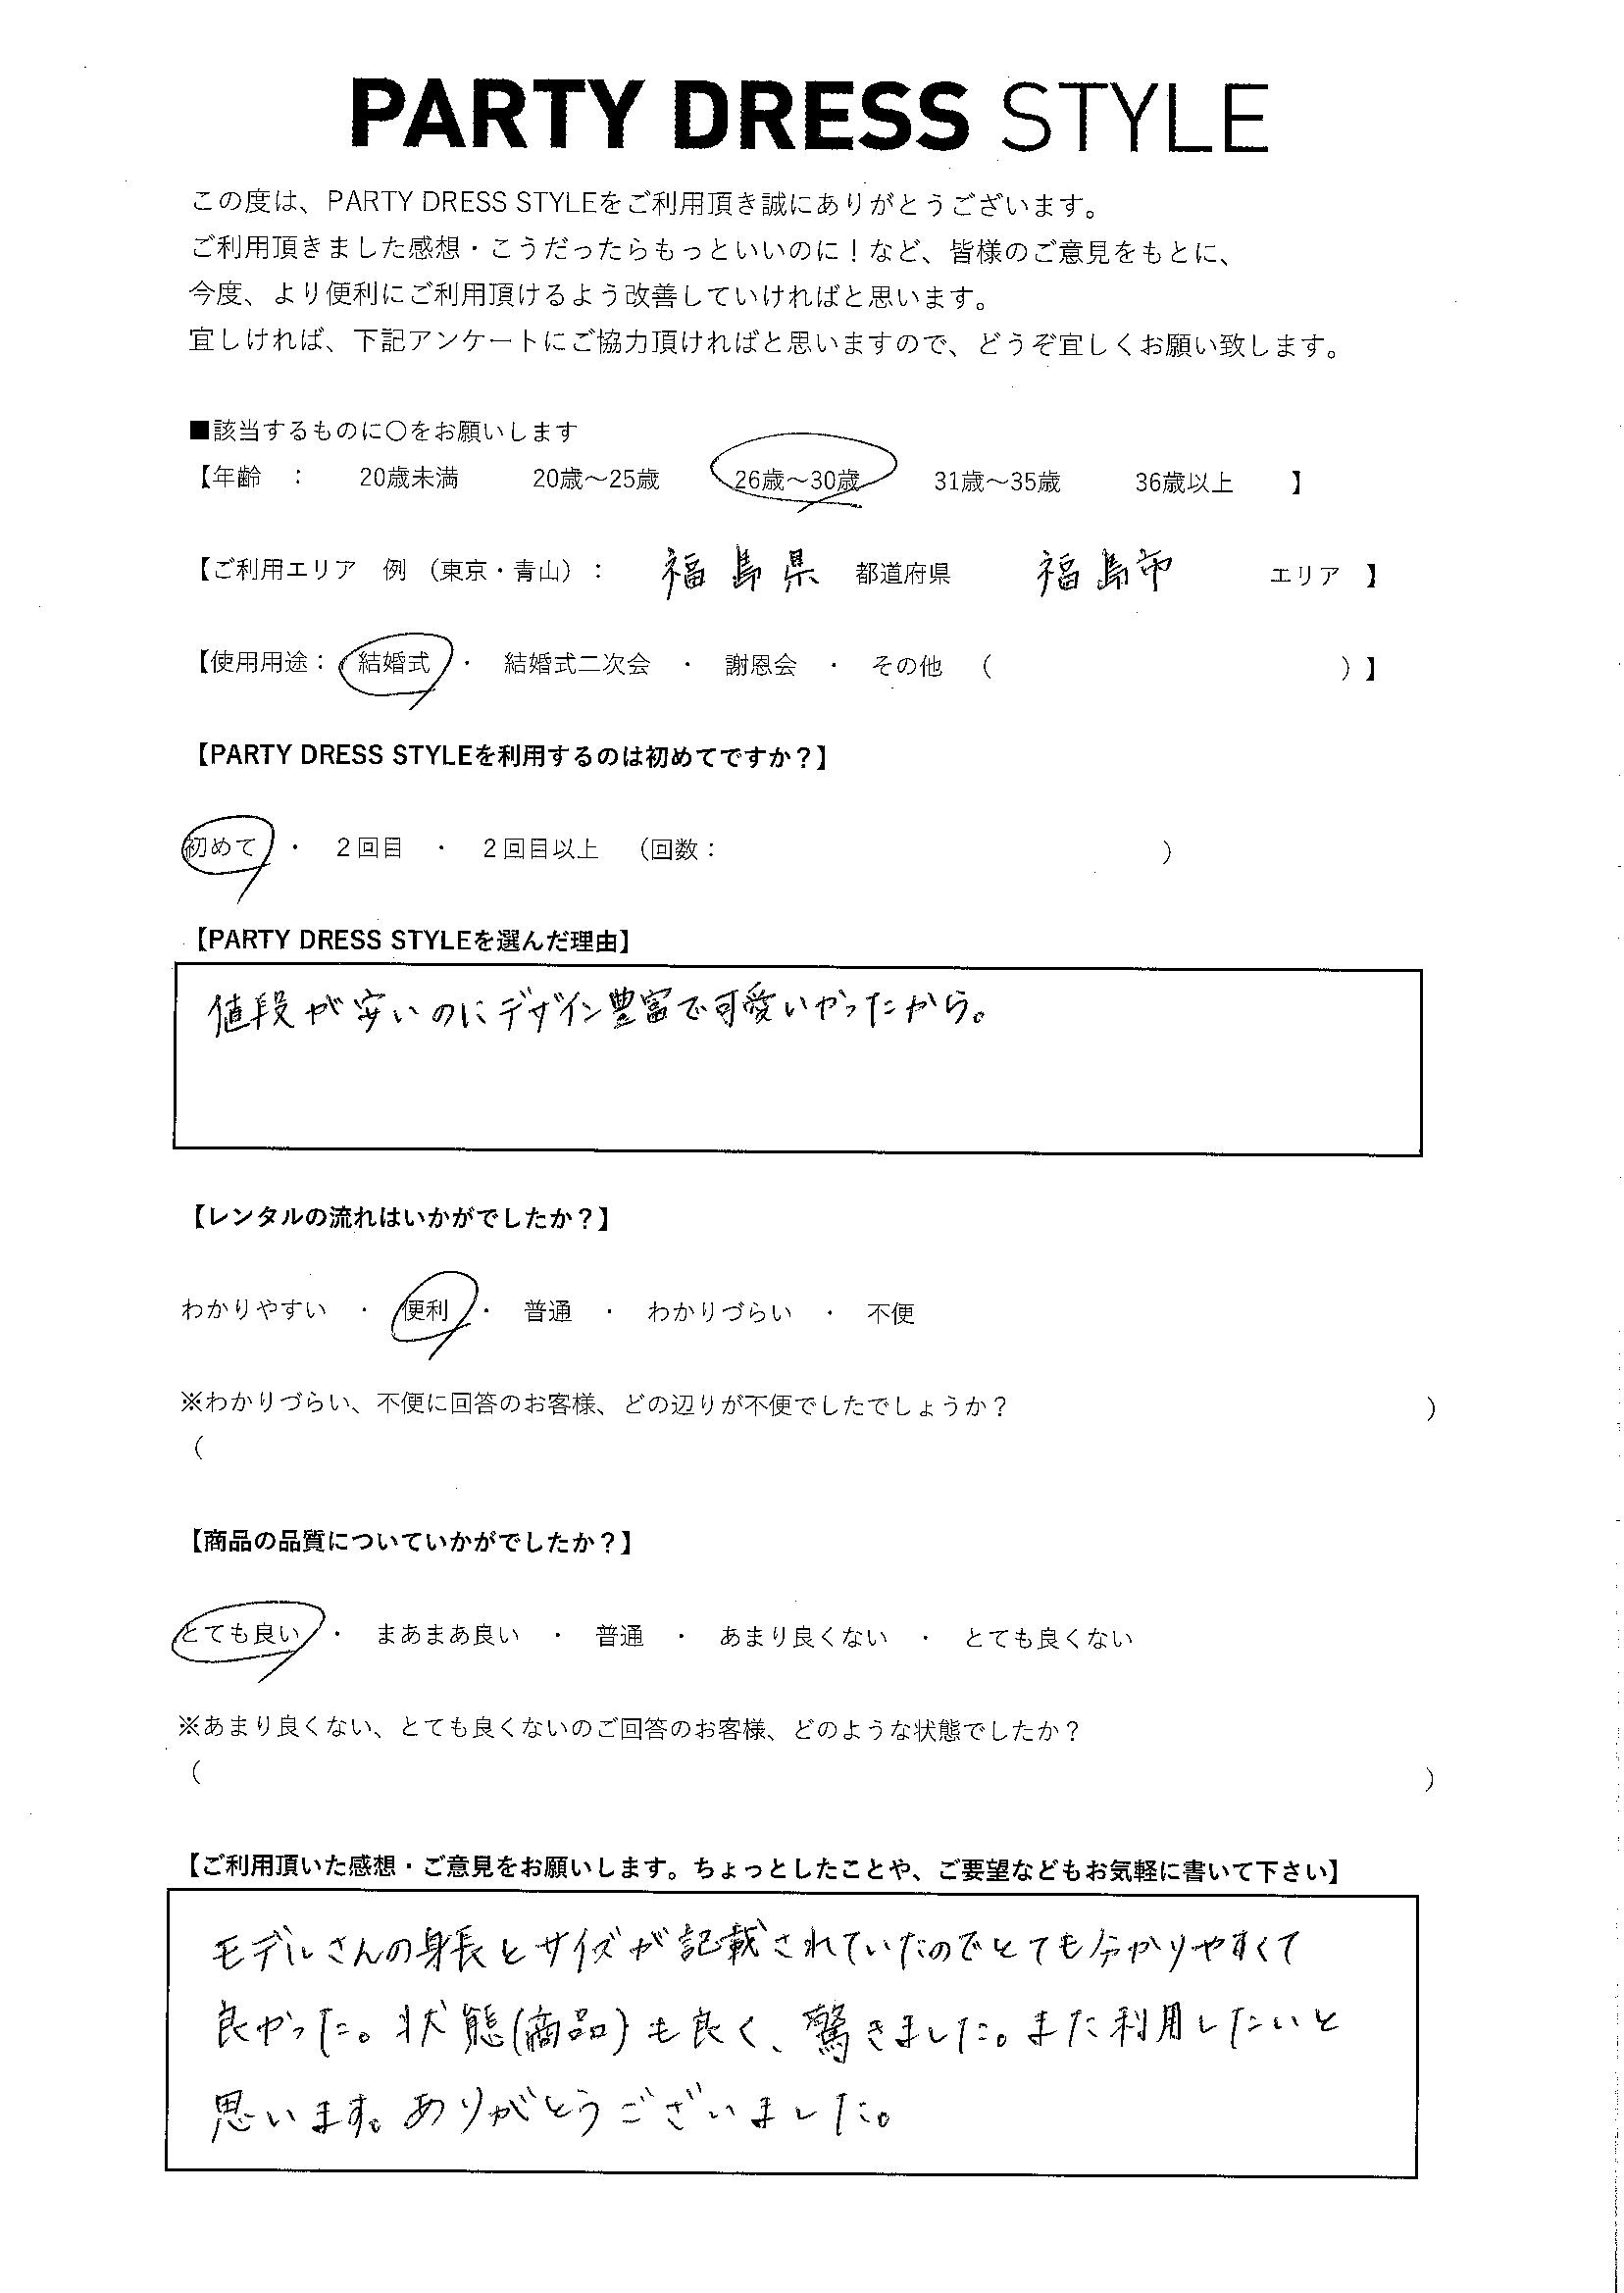 5/18結婚式利用 福島県・福島エリア